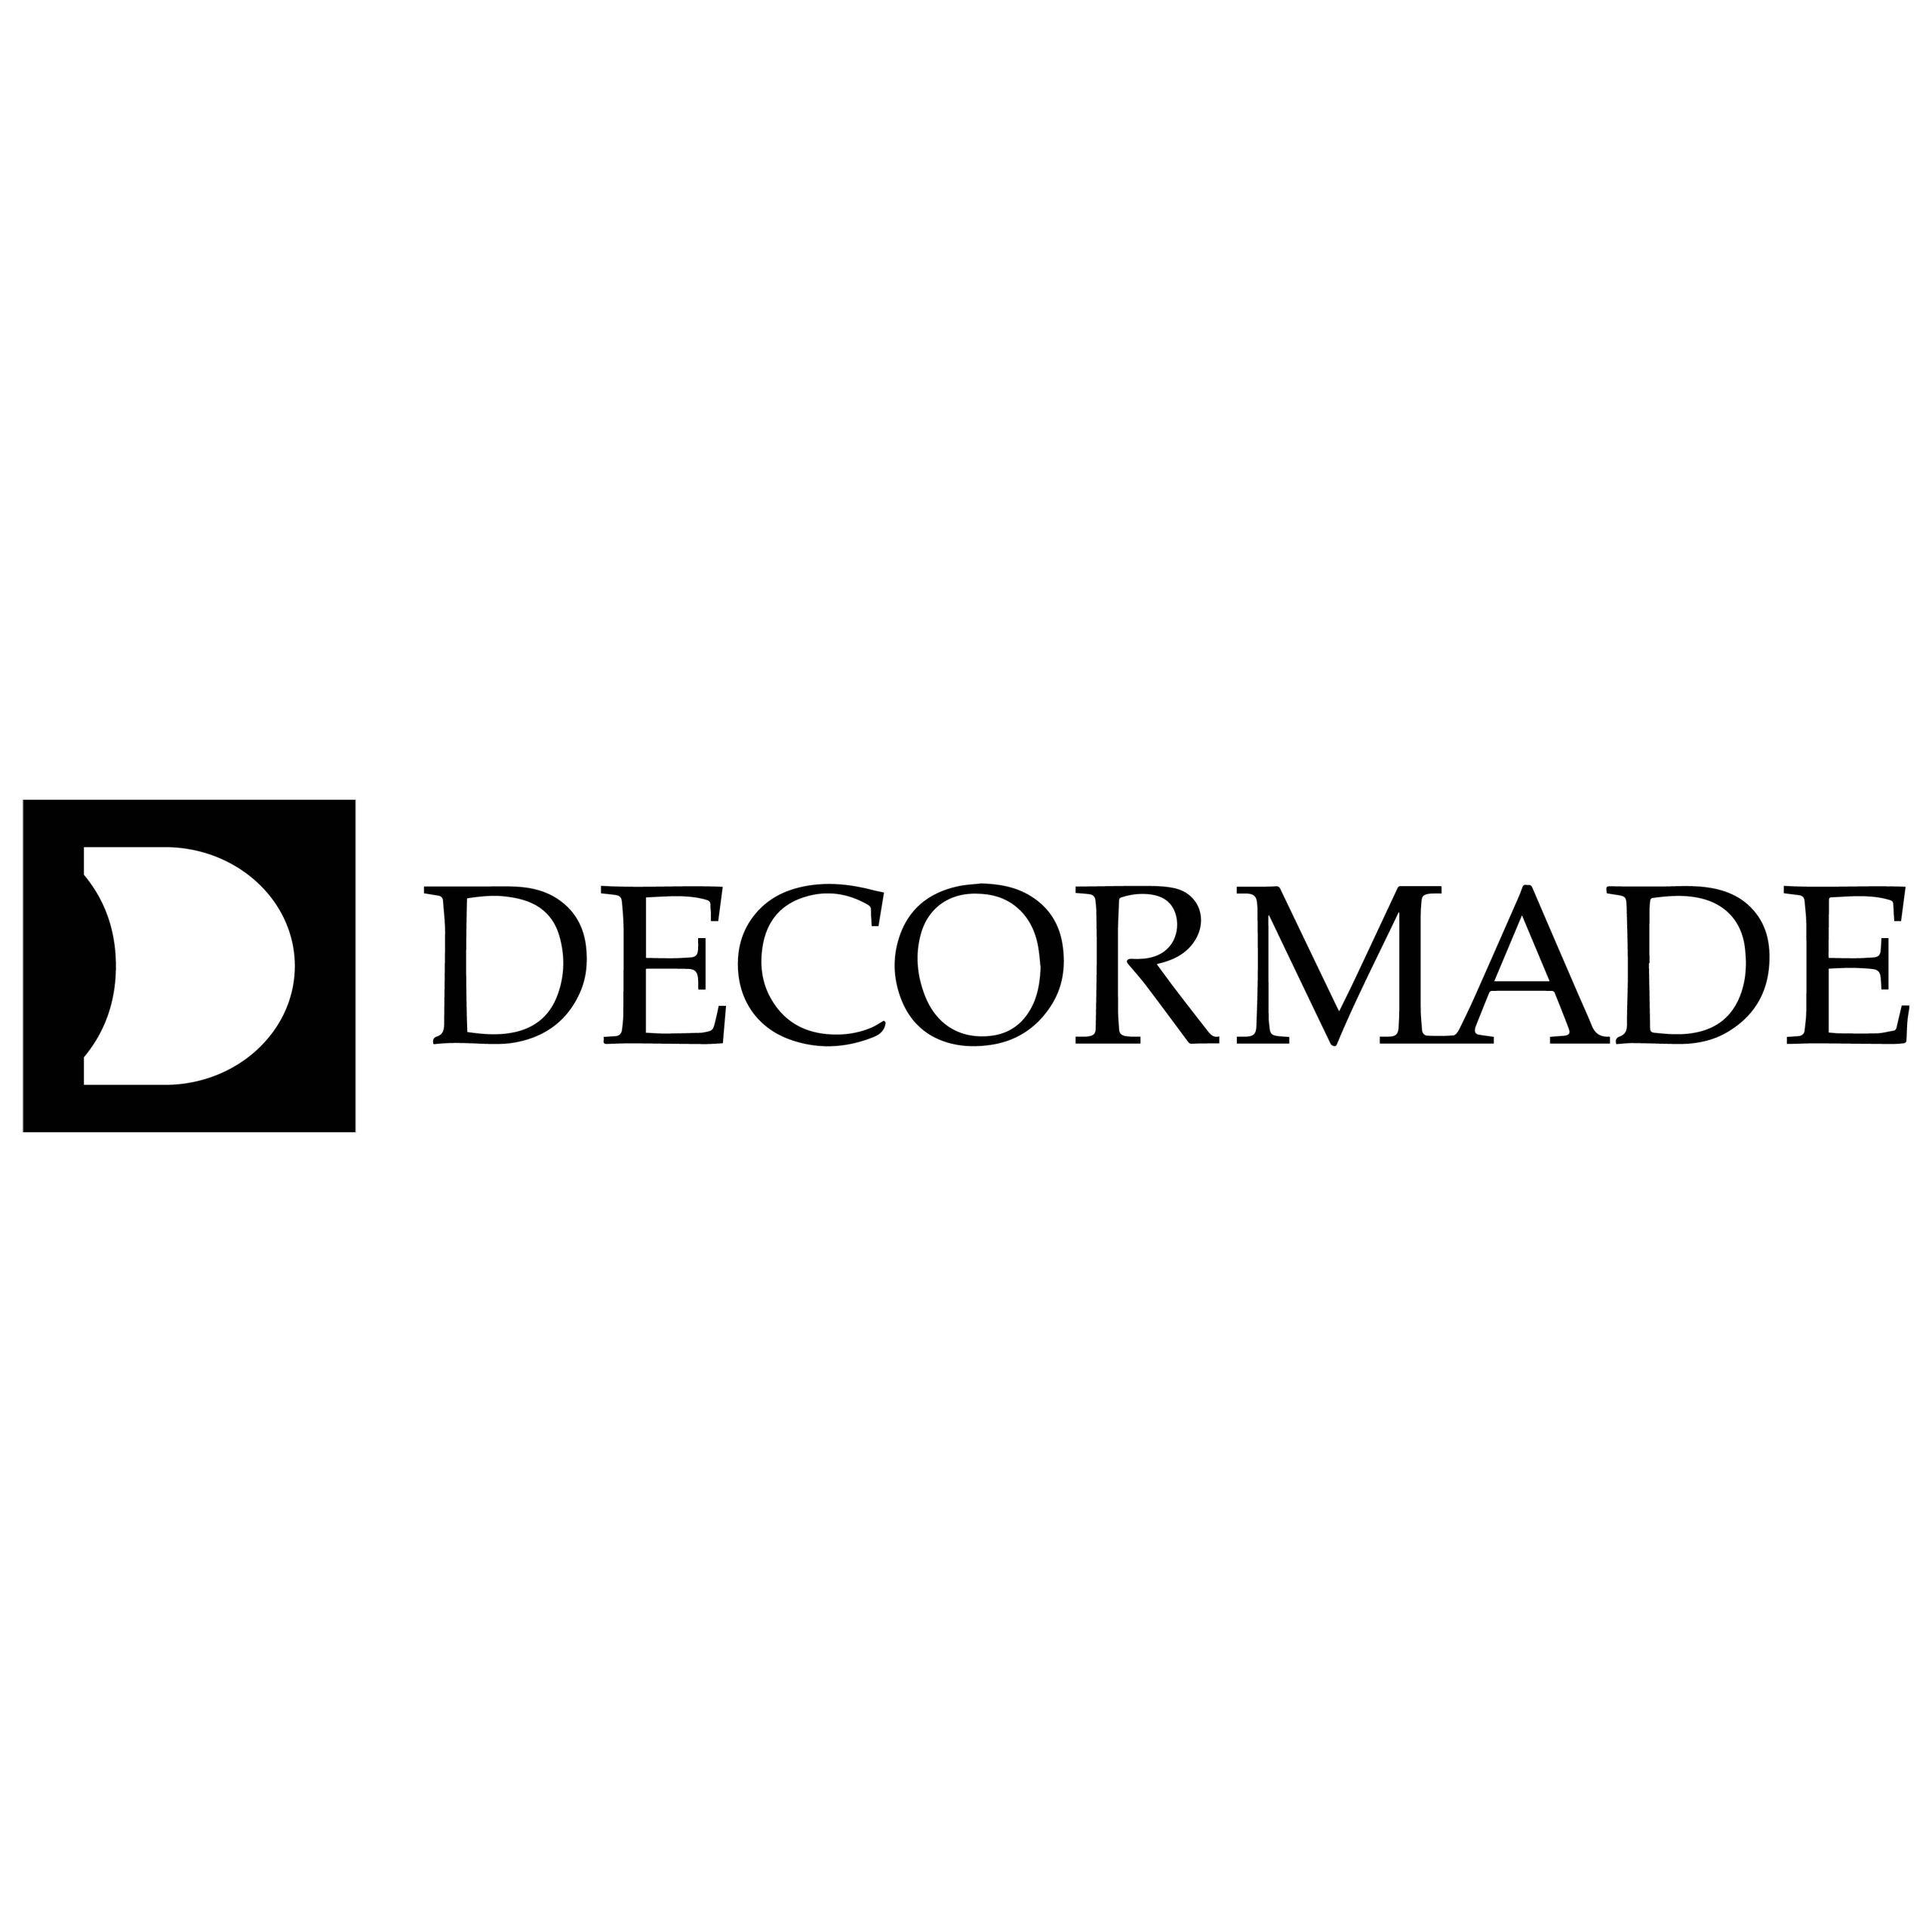 Decormade